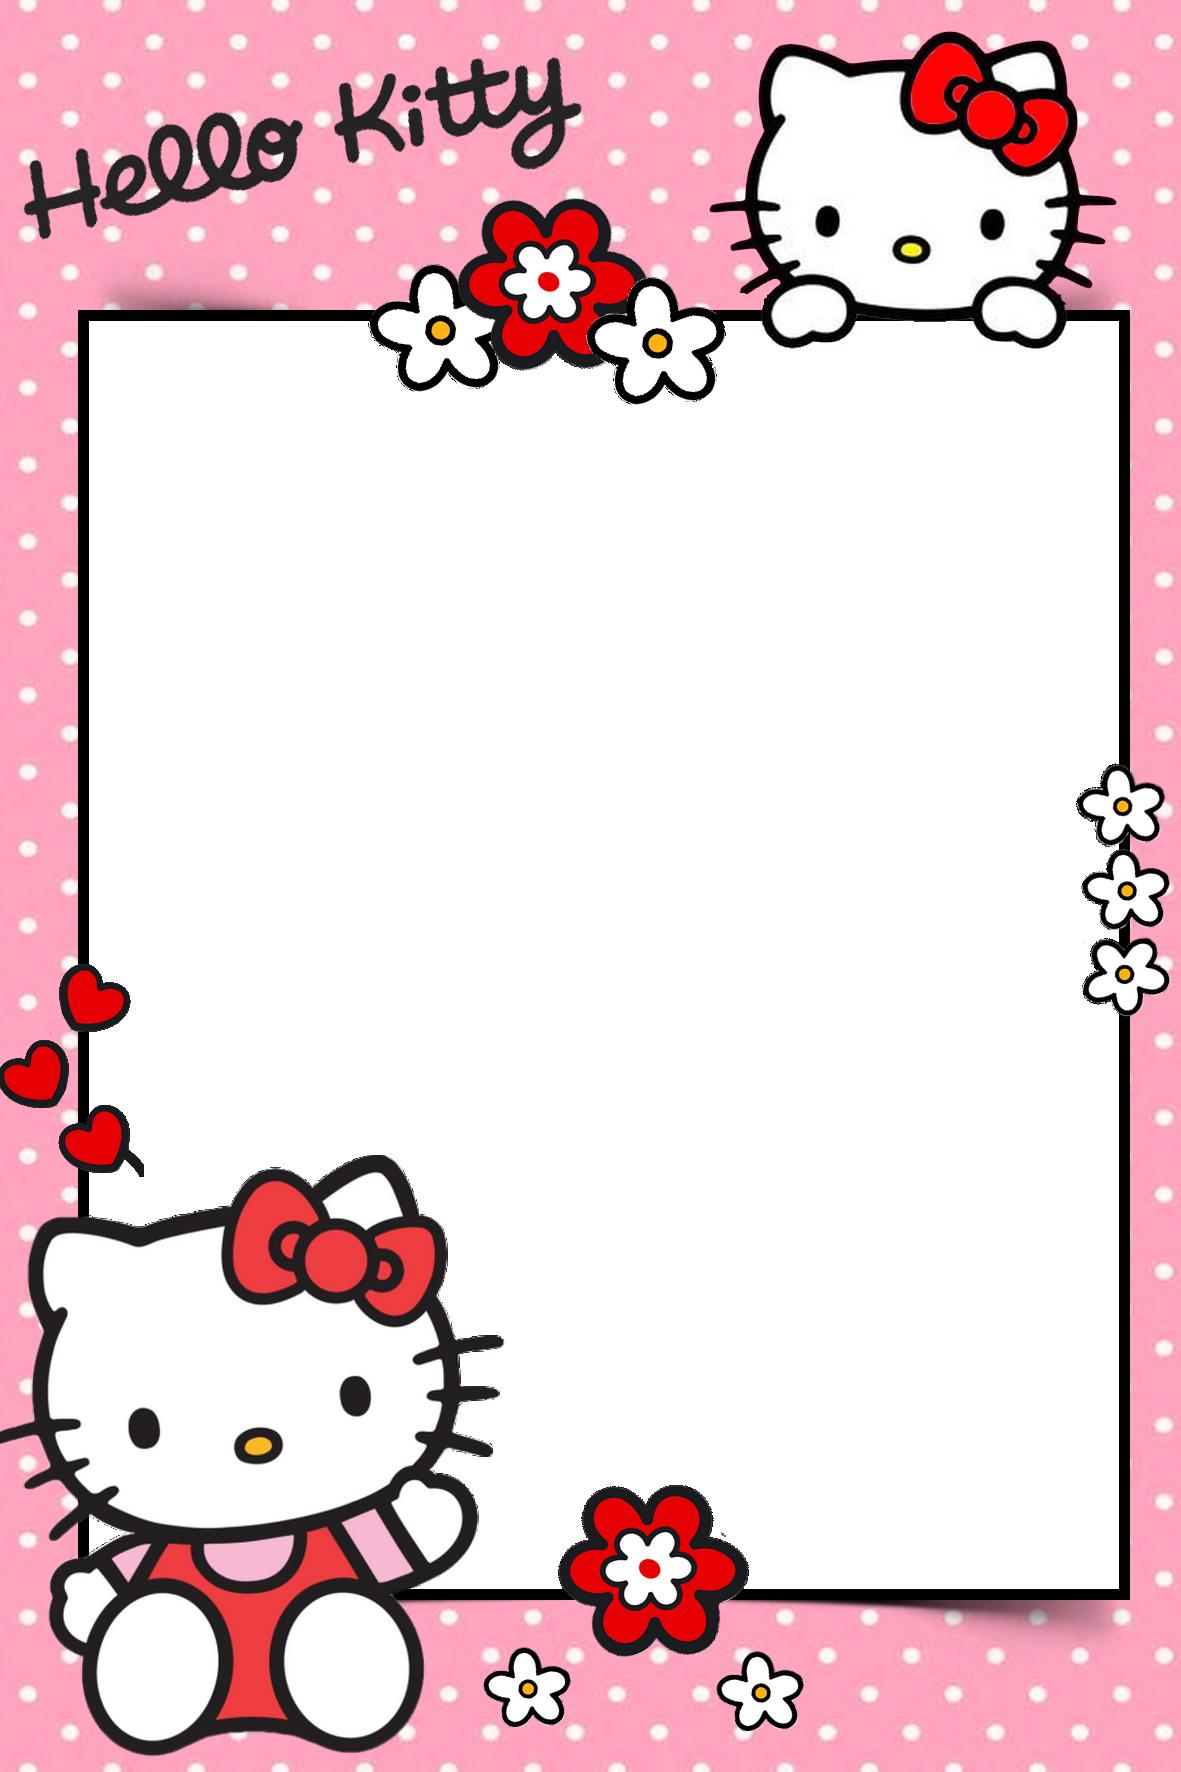 Frame for children PNG  Hello kitty invitations Hello